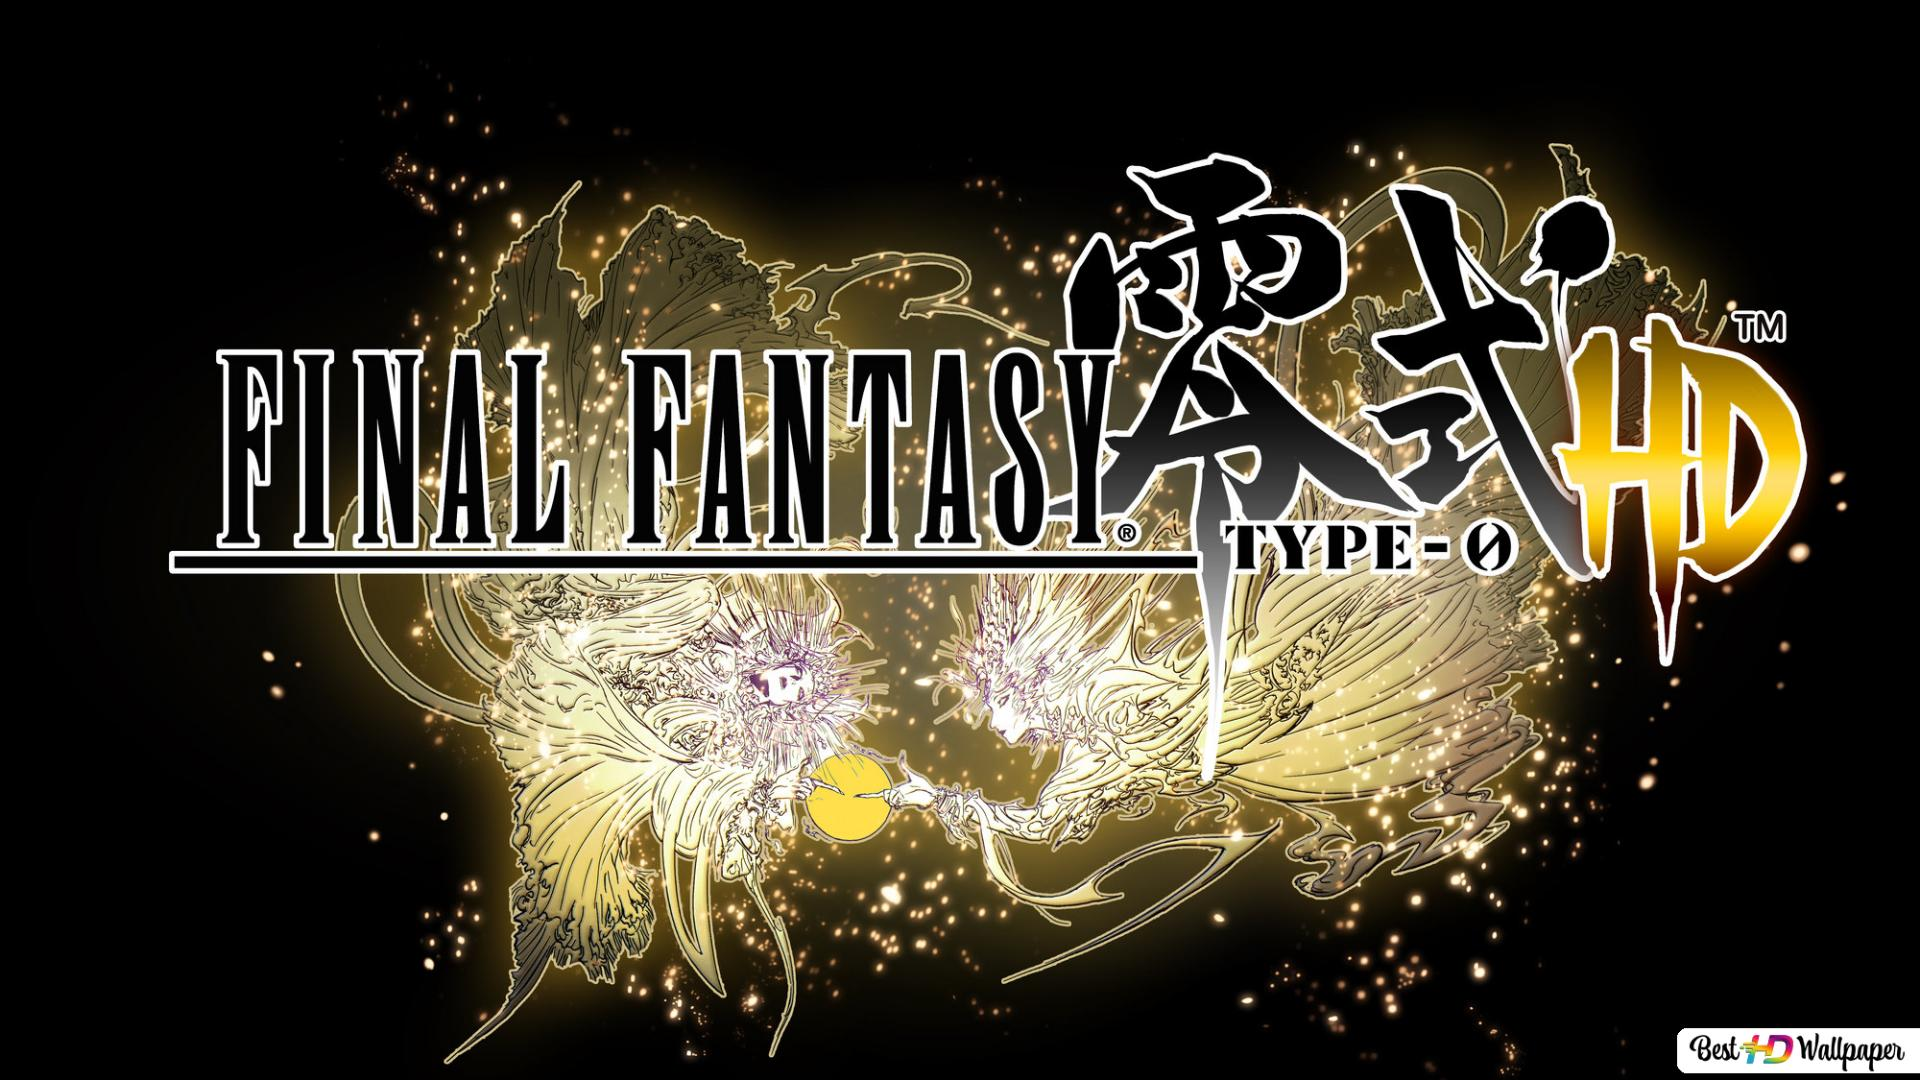 Final Fantasy Type 0 Hd Logo Hd Wallpaper Download